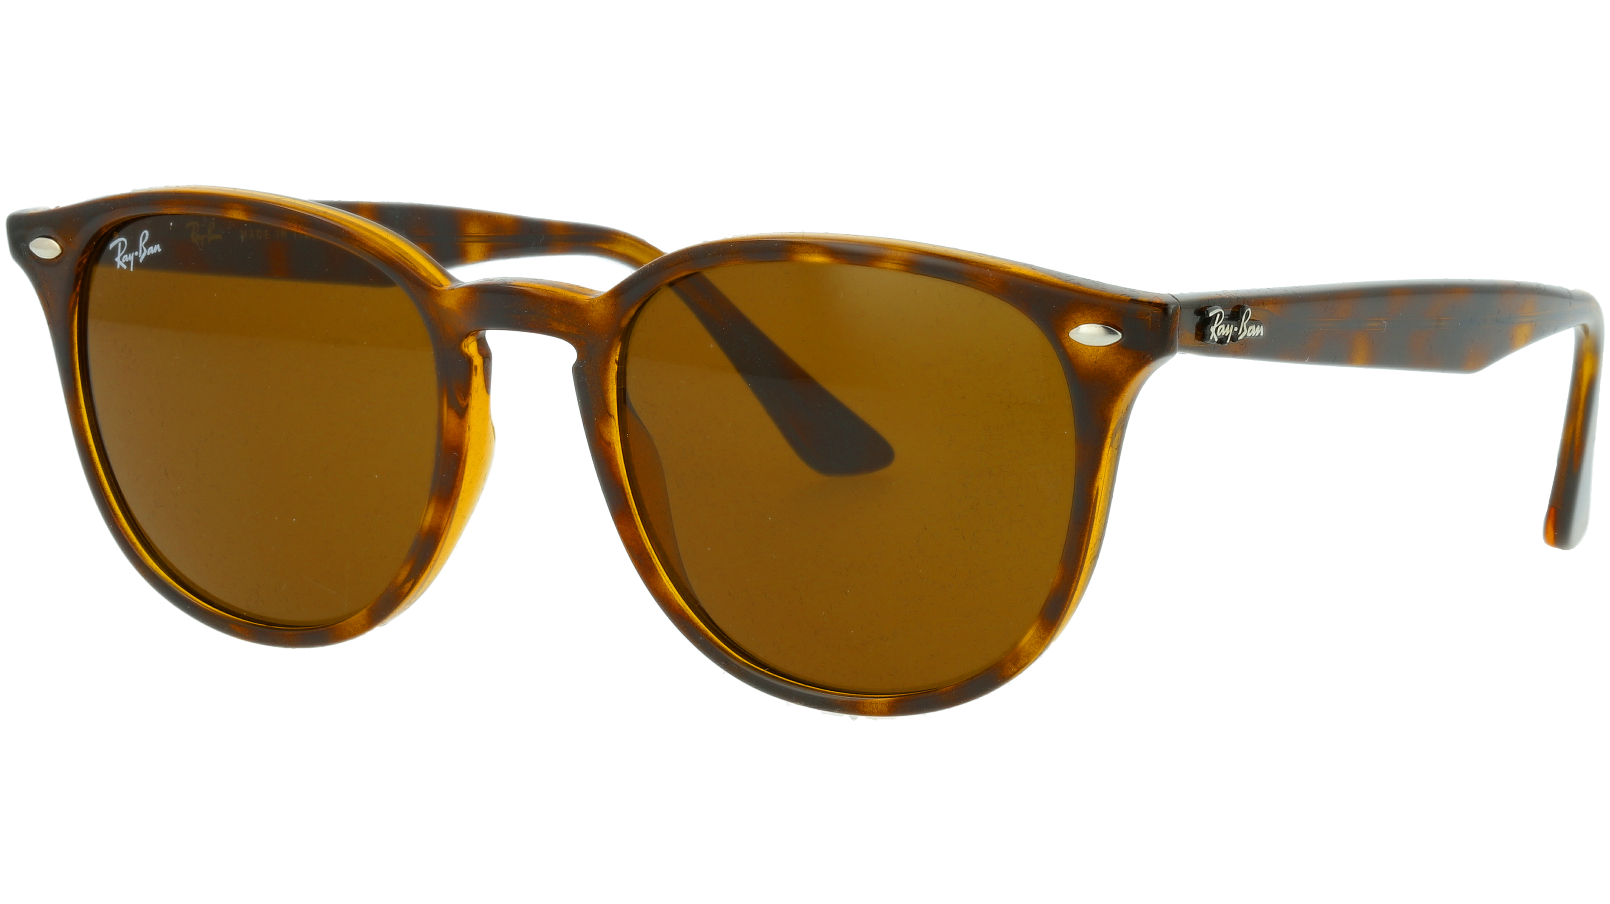 Ray-Ban RB4259 710/73 51 LIGHT Sunglasses